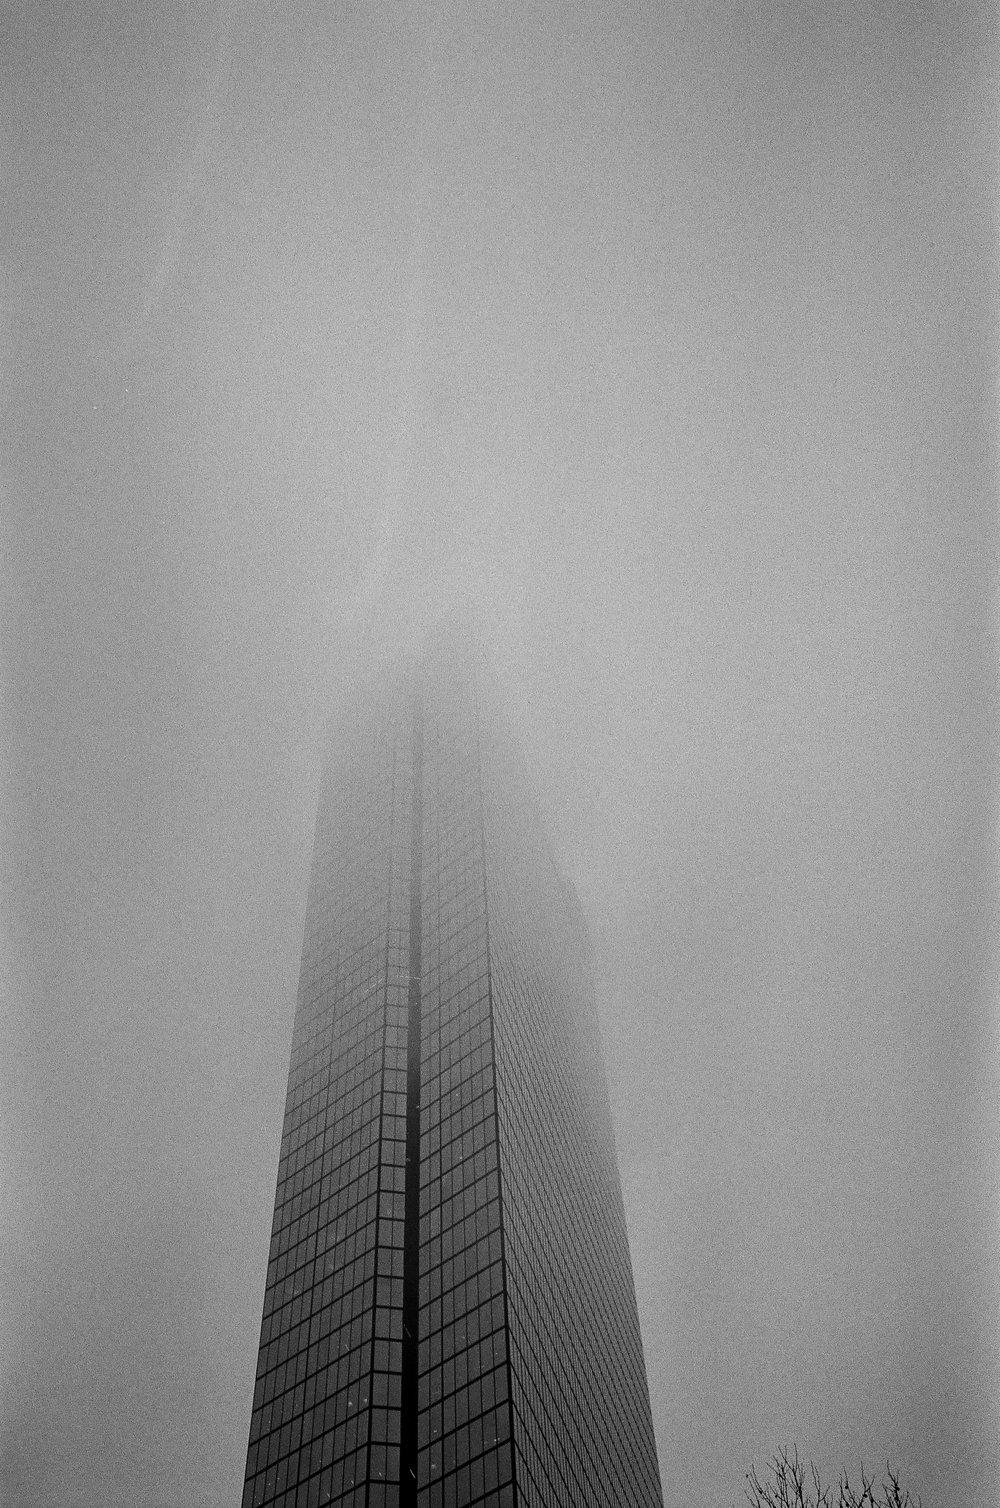 LeicaM6012018-1089.jpg